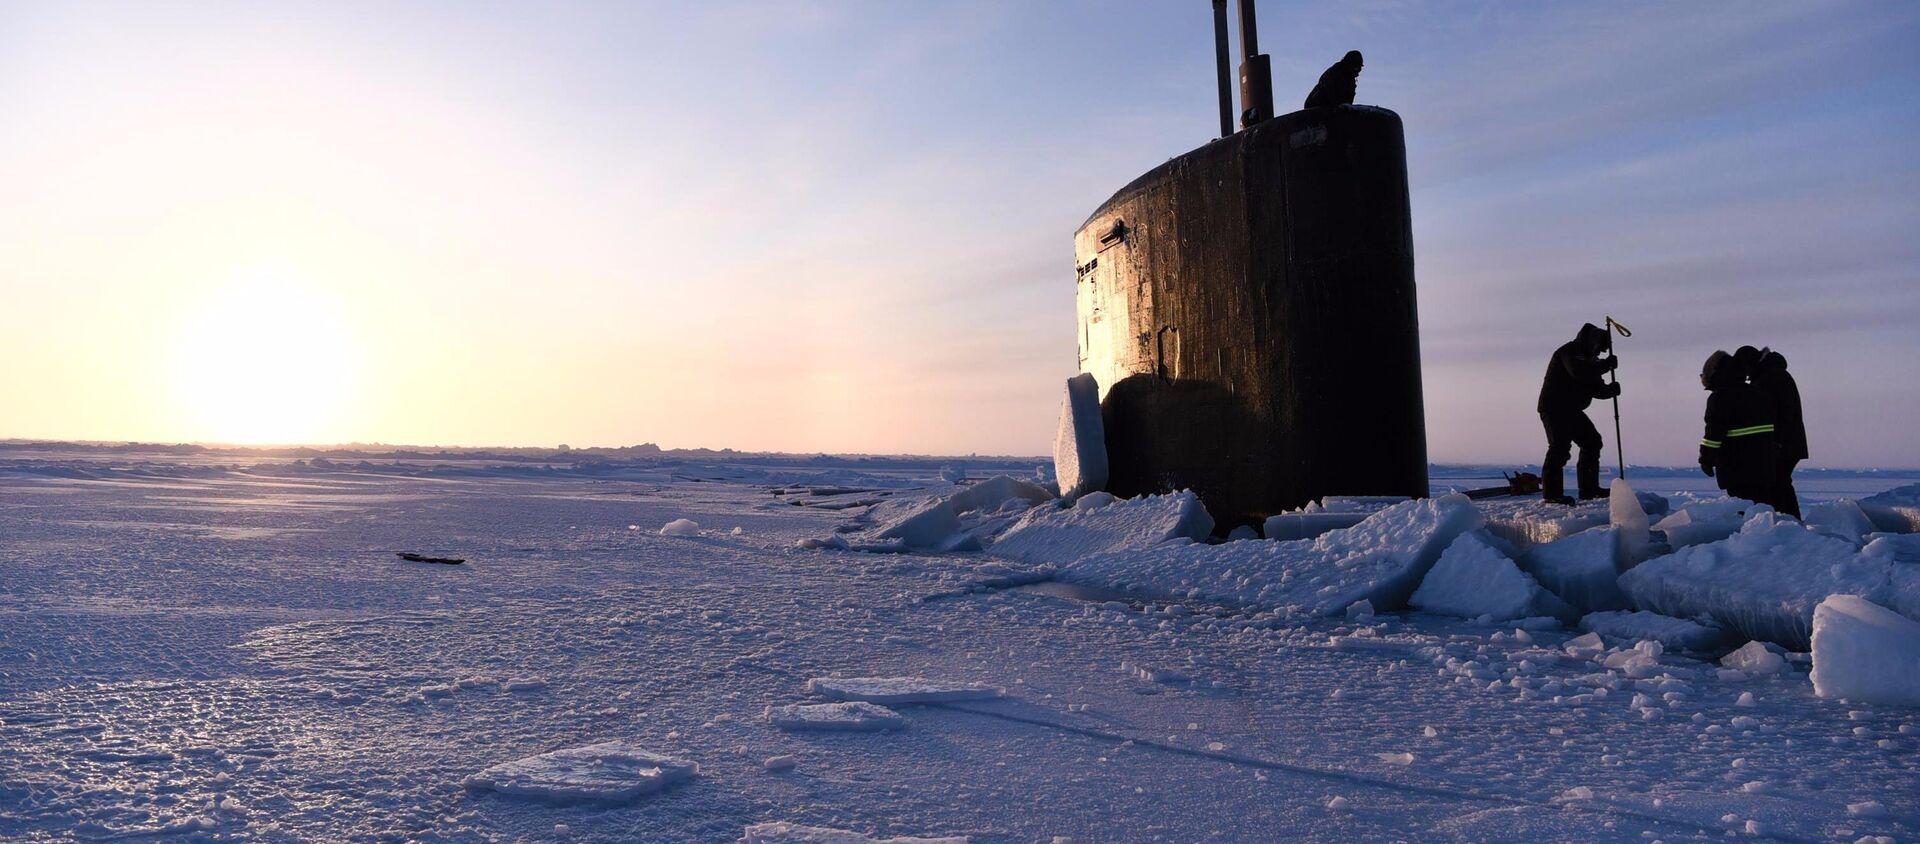 Подводная лодка ВМС США во время учений Арктике ICEX-2018 - Sputnik Latvija, 1920, 25.10.2020